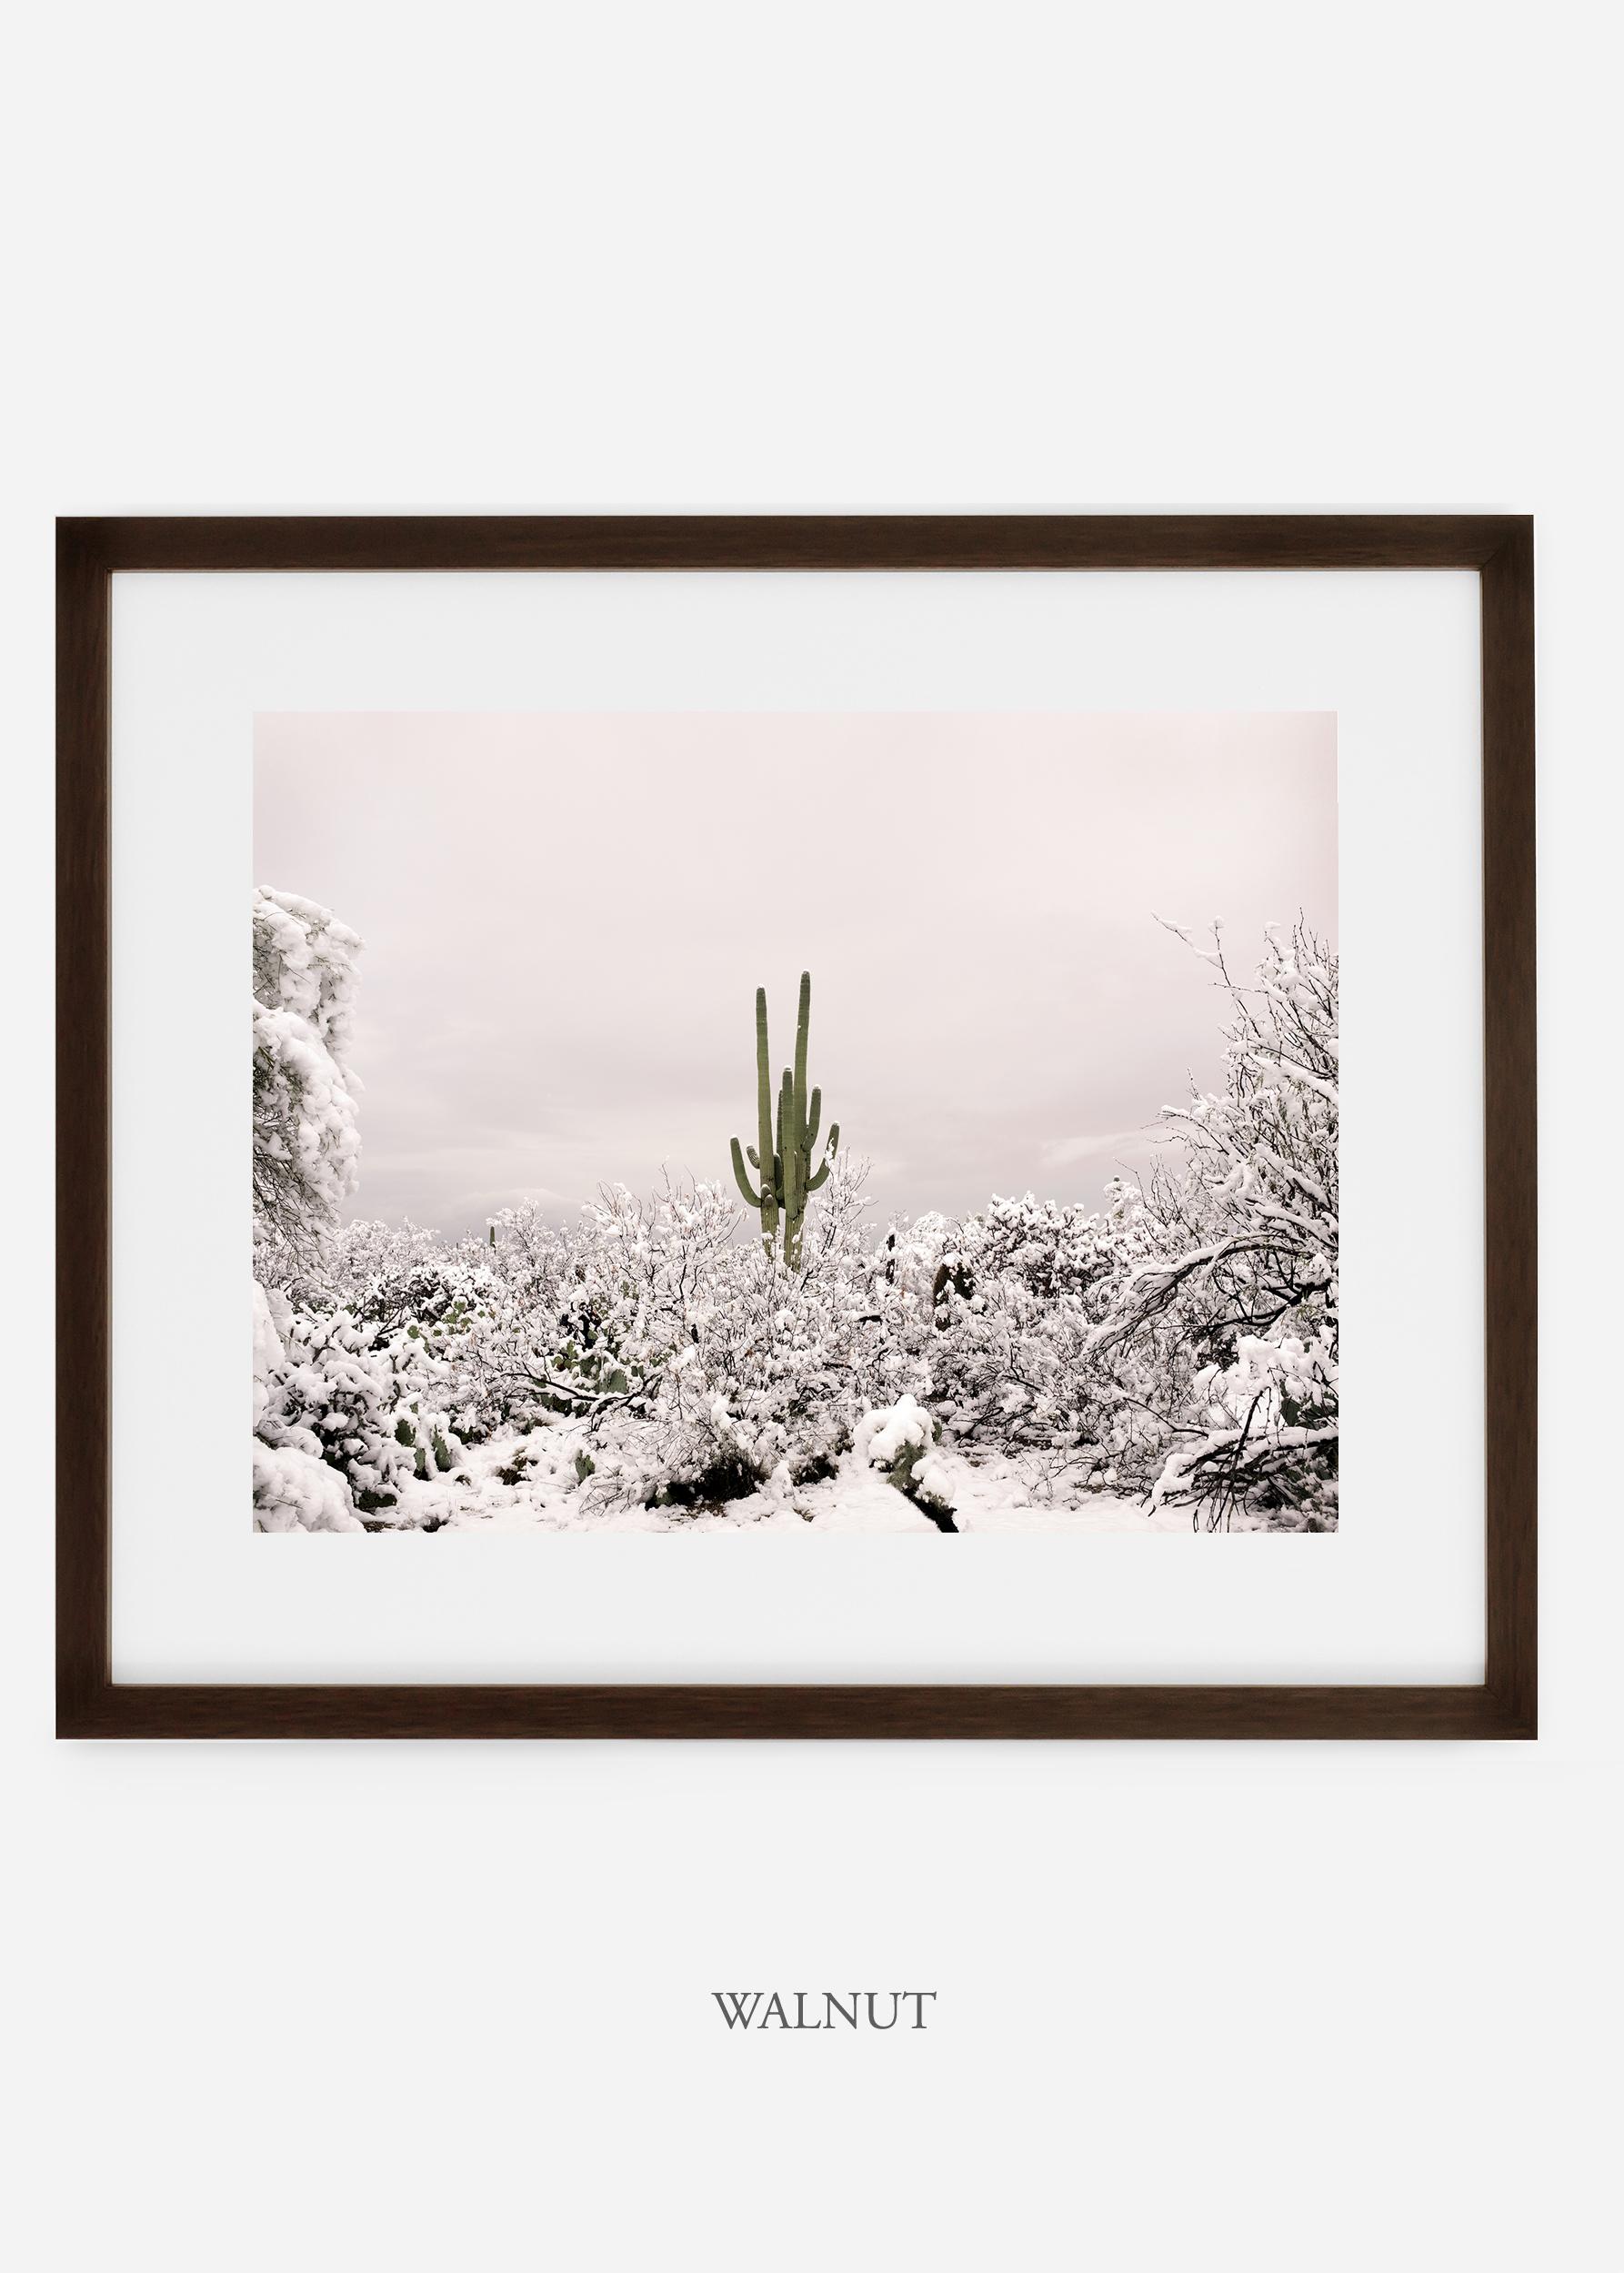 walnutframe-saguaroNo.1-wildercalifornia-art-wallart-cactusprint-homedecor-prints-arizona-botanical-artwork-interiordesign.jpg